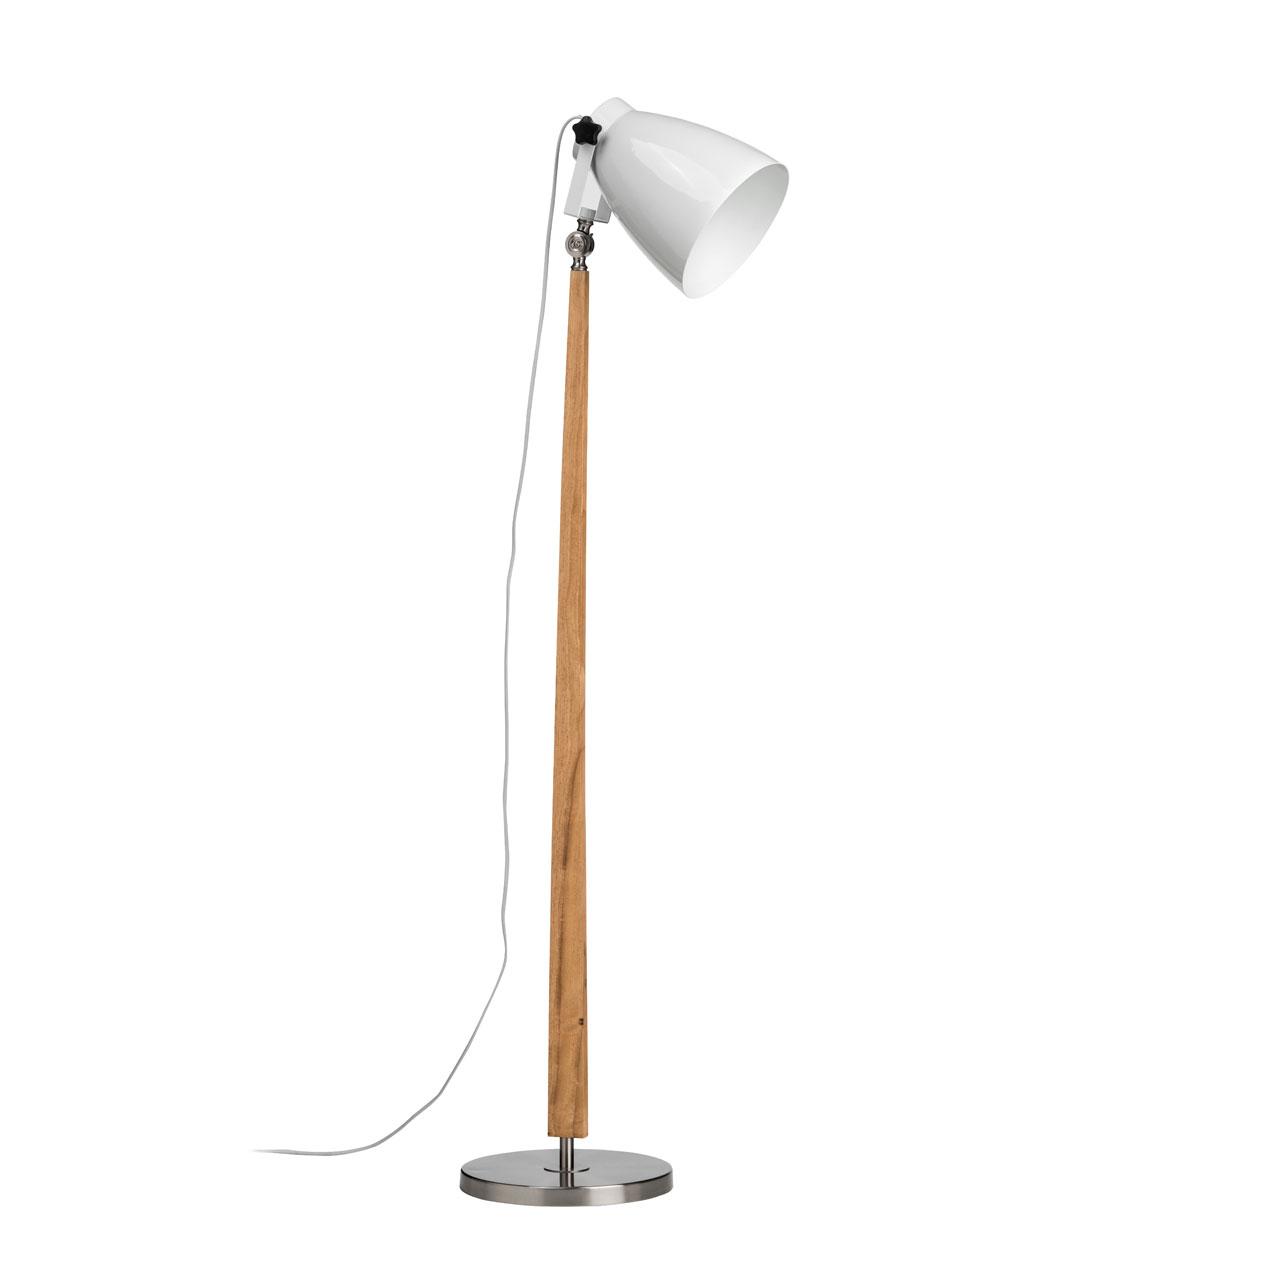 Details About Premier Housewares Stockholm Floor Lamp Nickel Light Wood Base White Shade